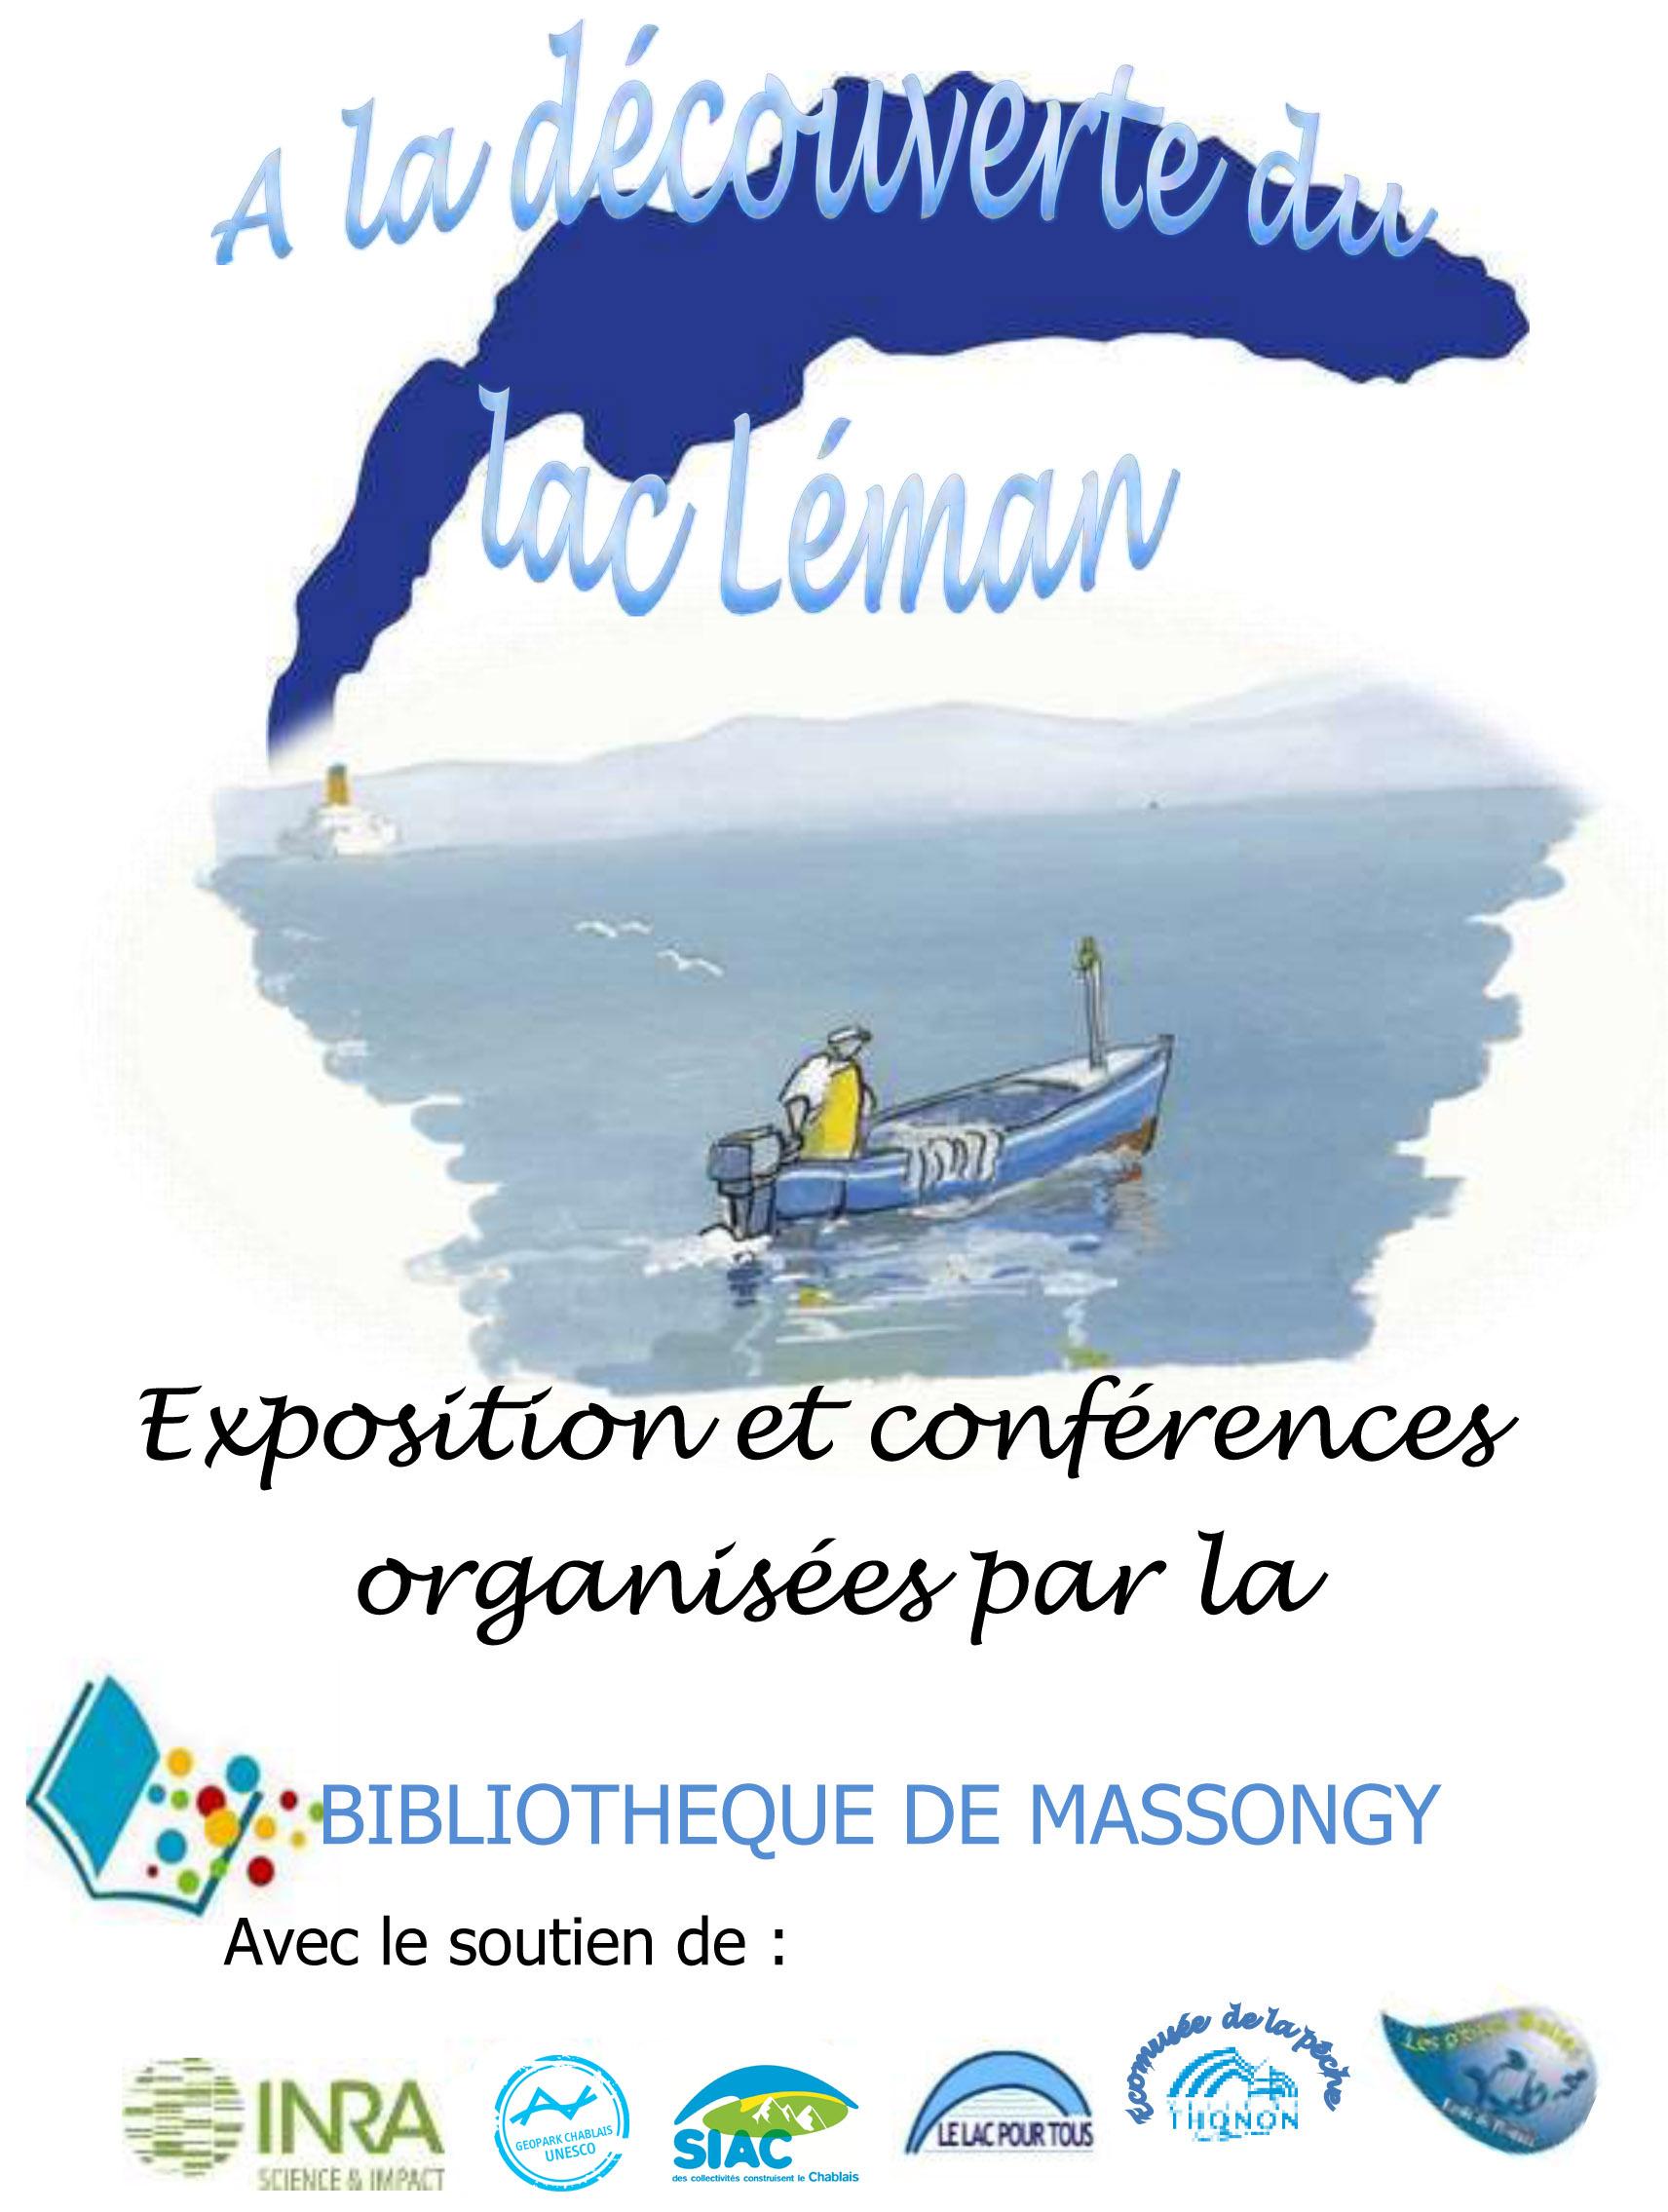 affiche expo léman biblio massongy 2017